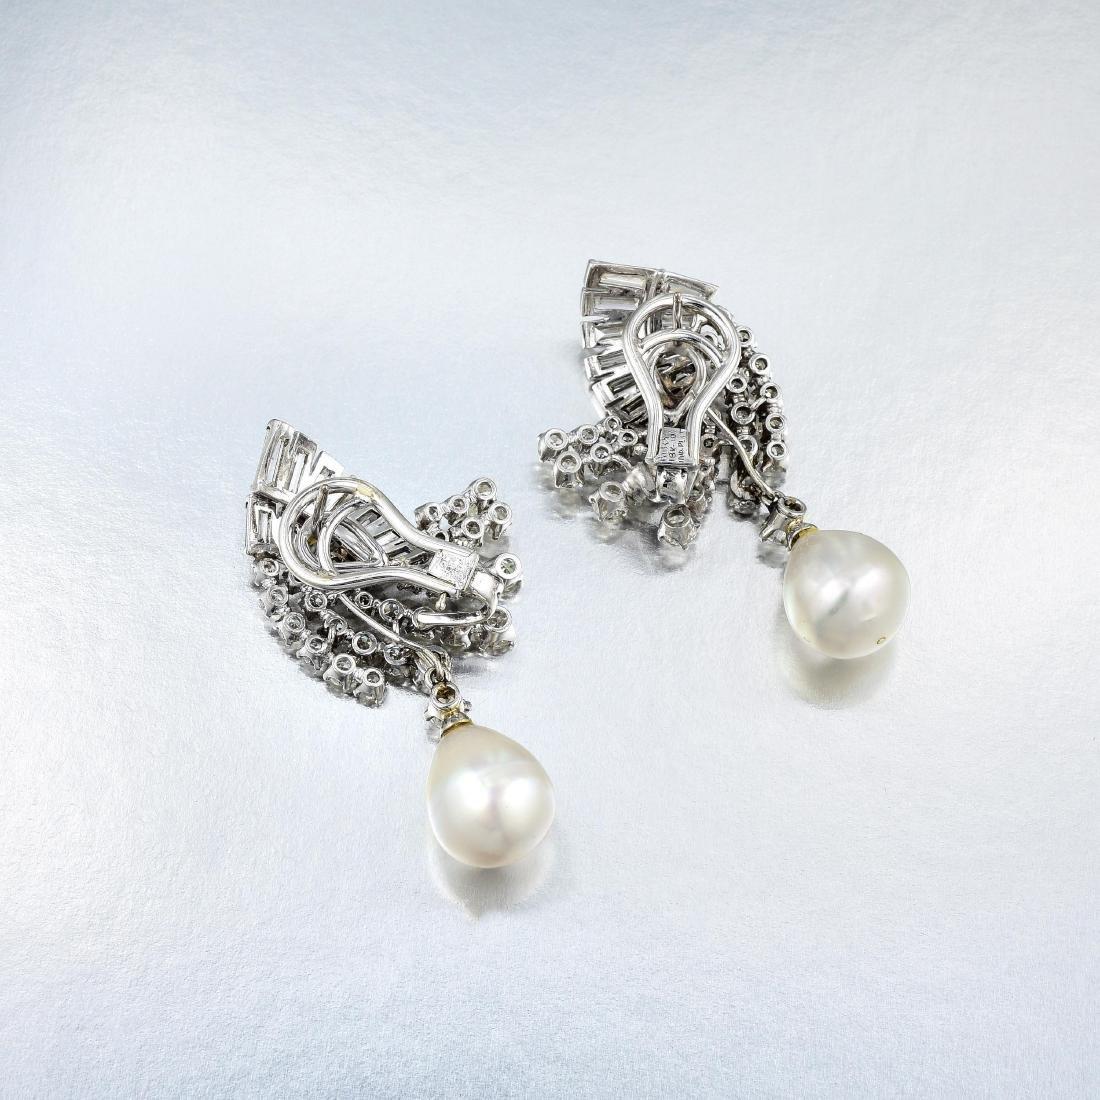 Ruser Diamond and Pearl Drop Earrings - 2